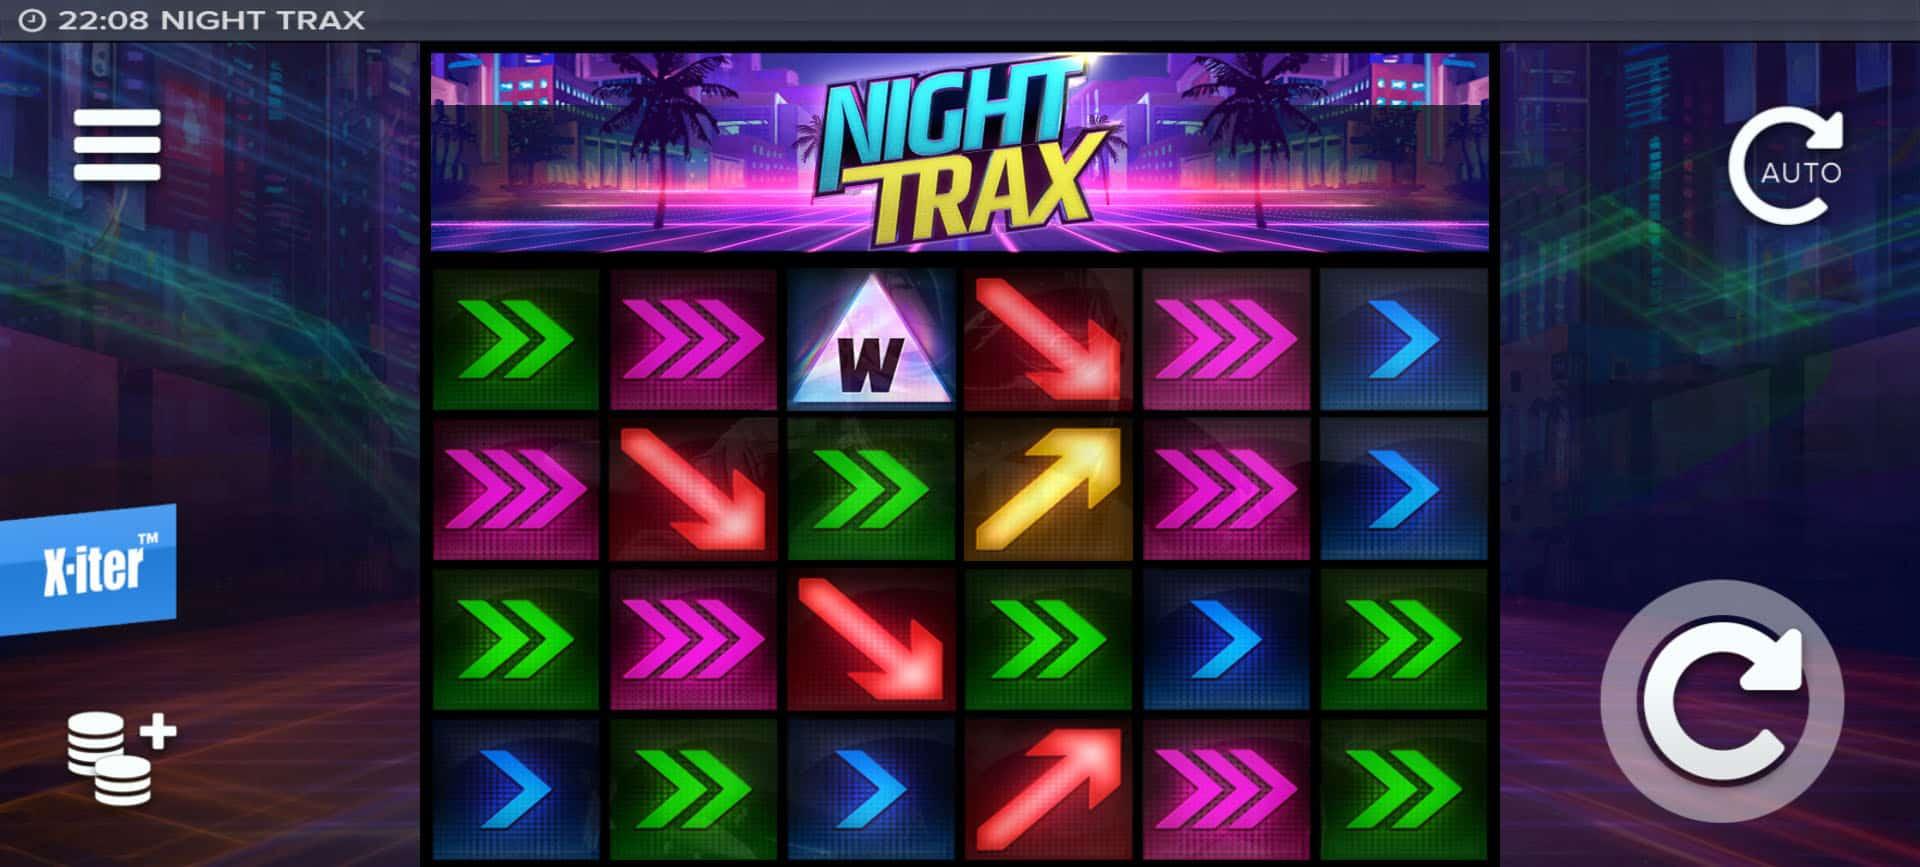 ELK Studios' Night Trax video slot